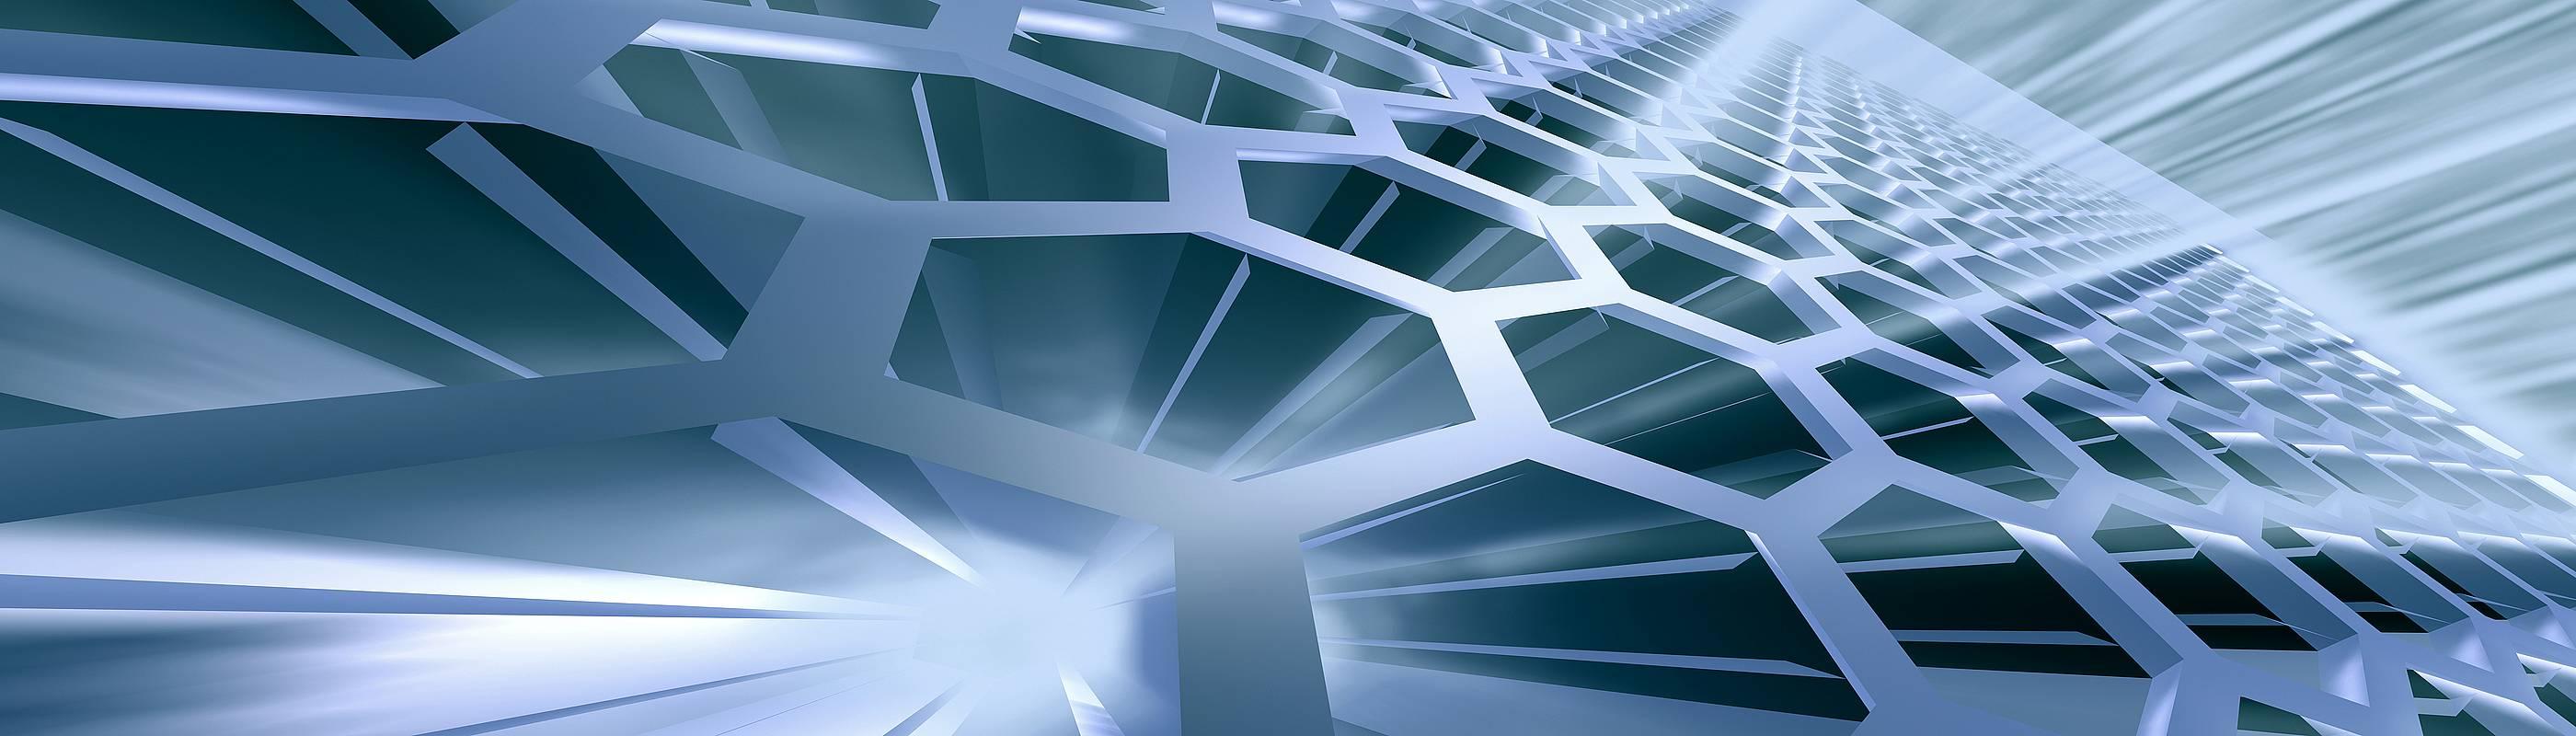 abstract technology representation depicting the technology organization umbrella